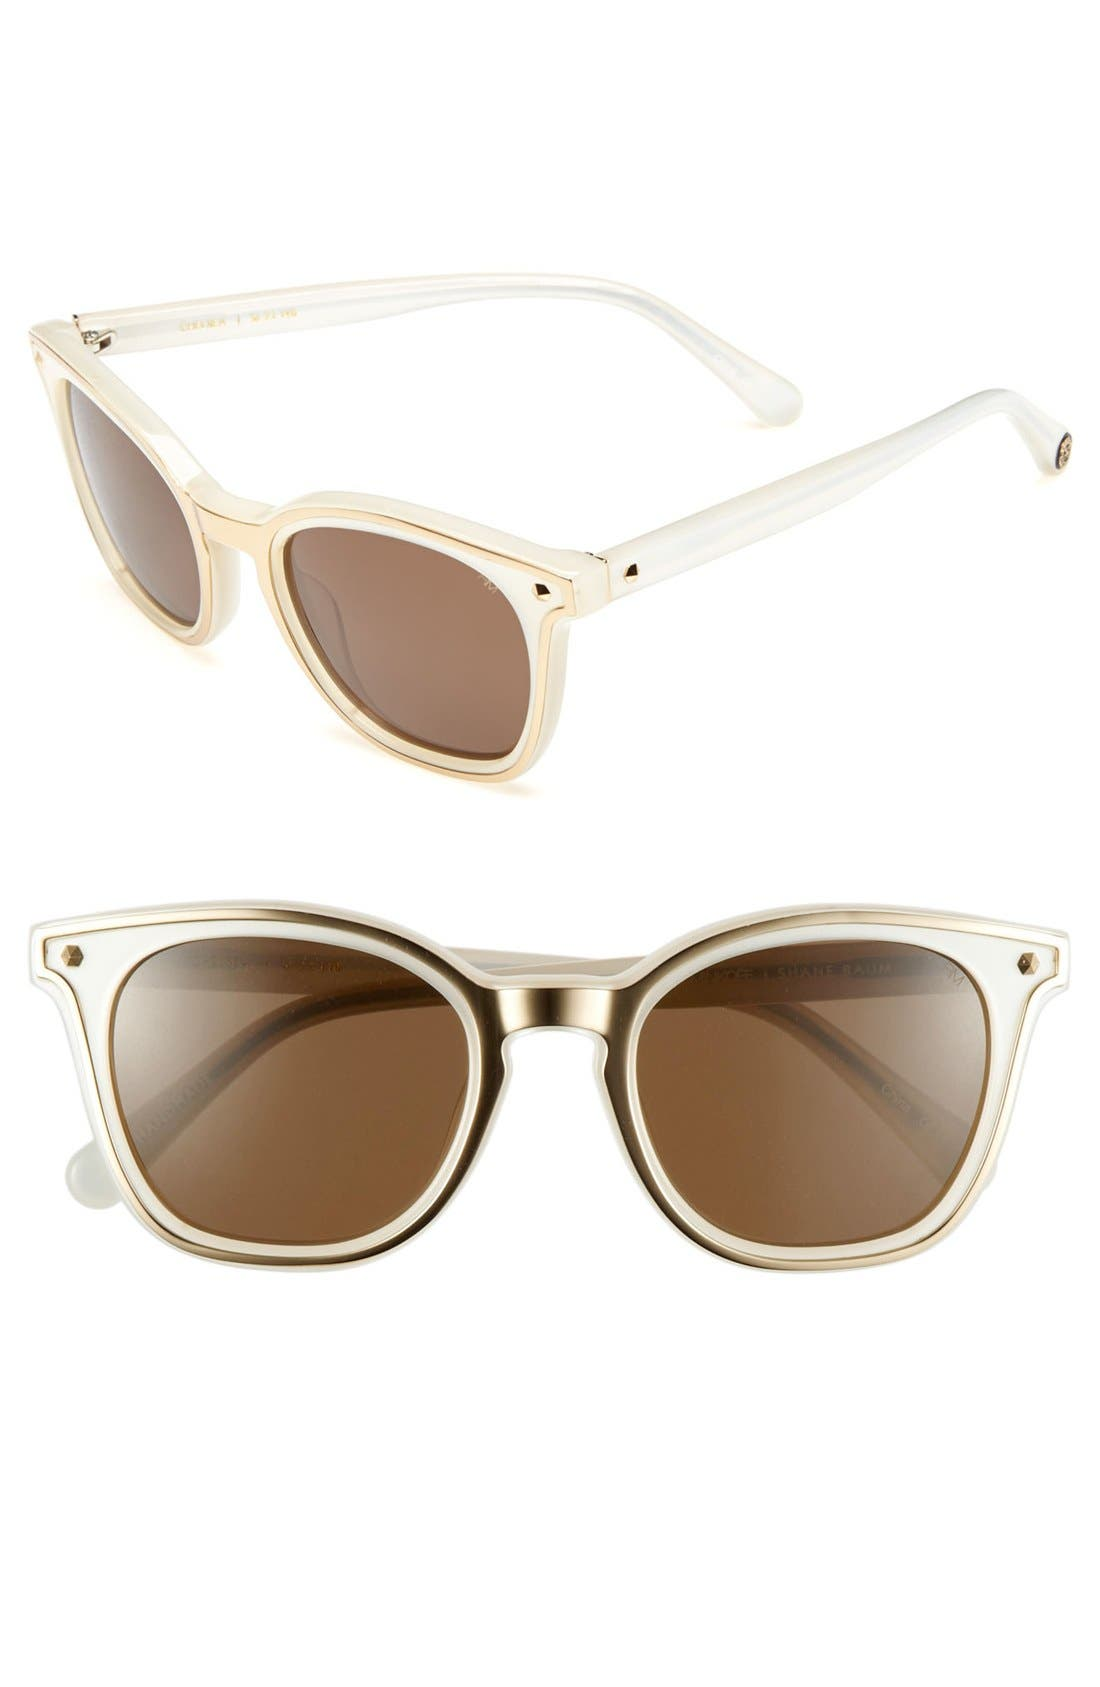 Main Image - Rebecca Minkoff 'Chelsea' Sunglasses